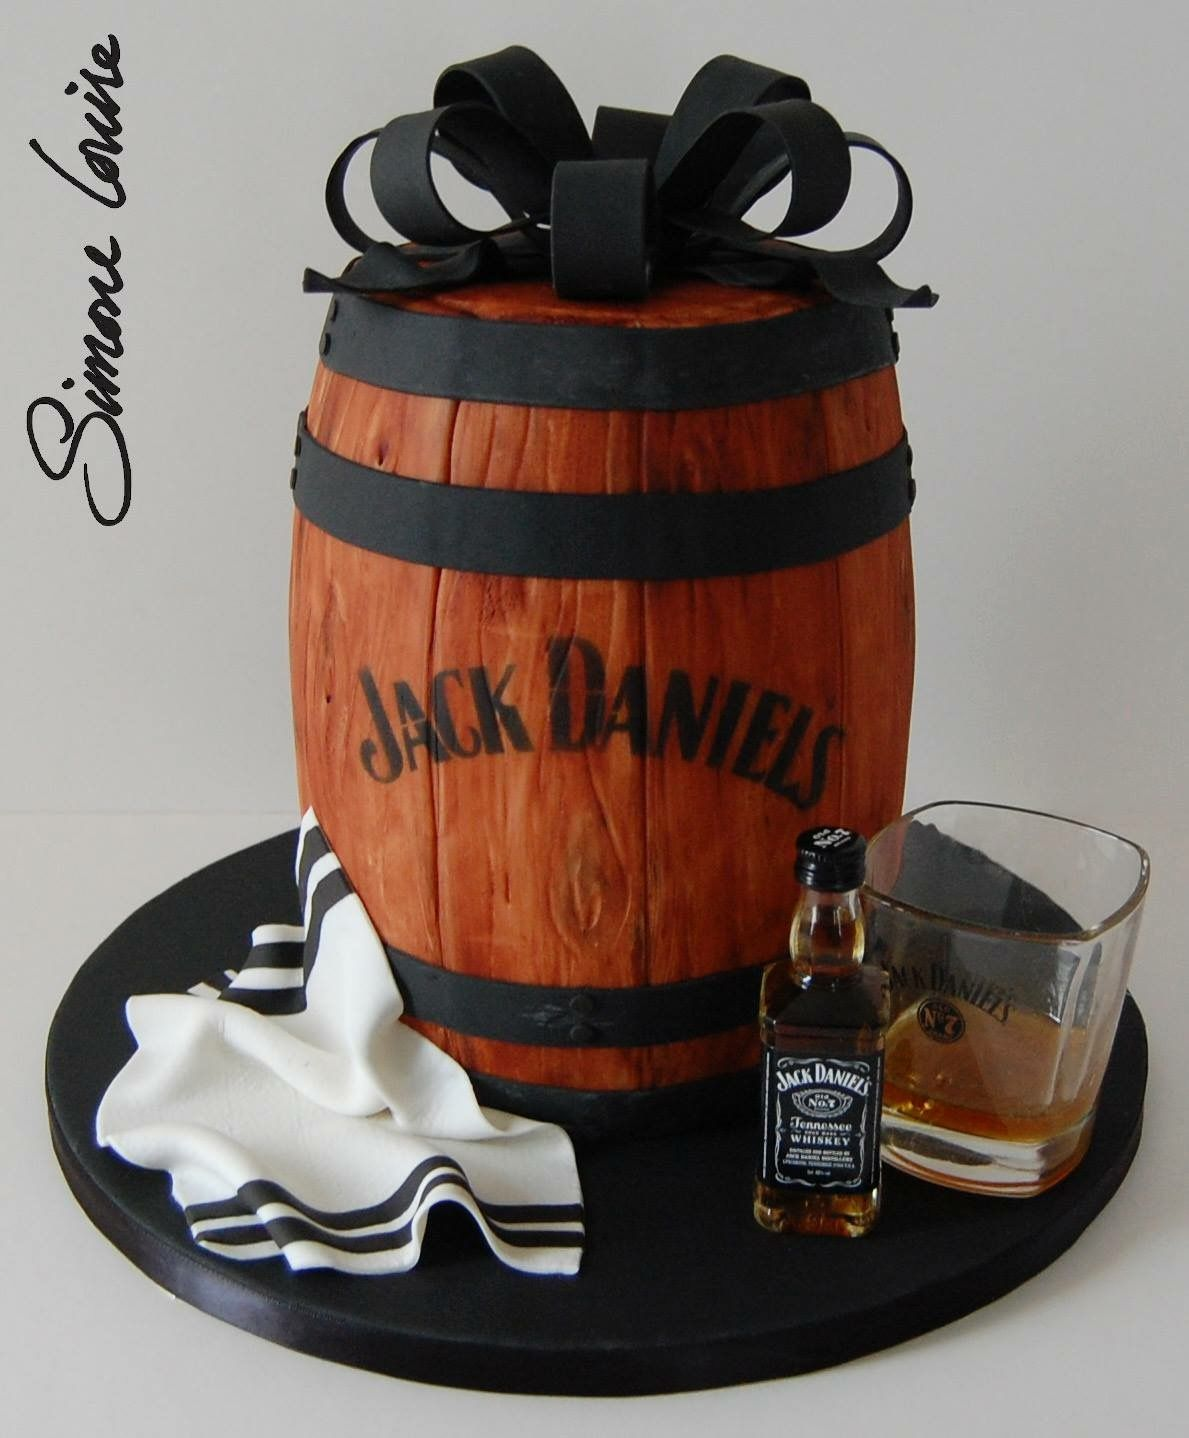 Jack Daniels barrel cake CAKES Masculine Pinterest Jack